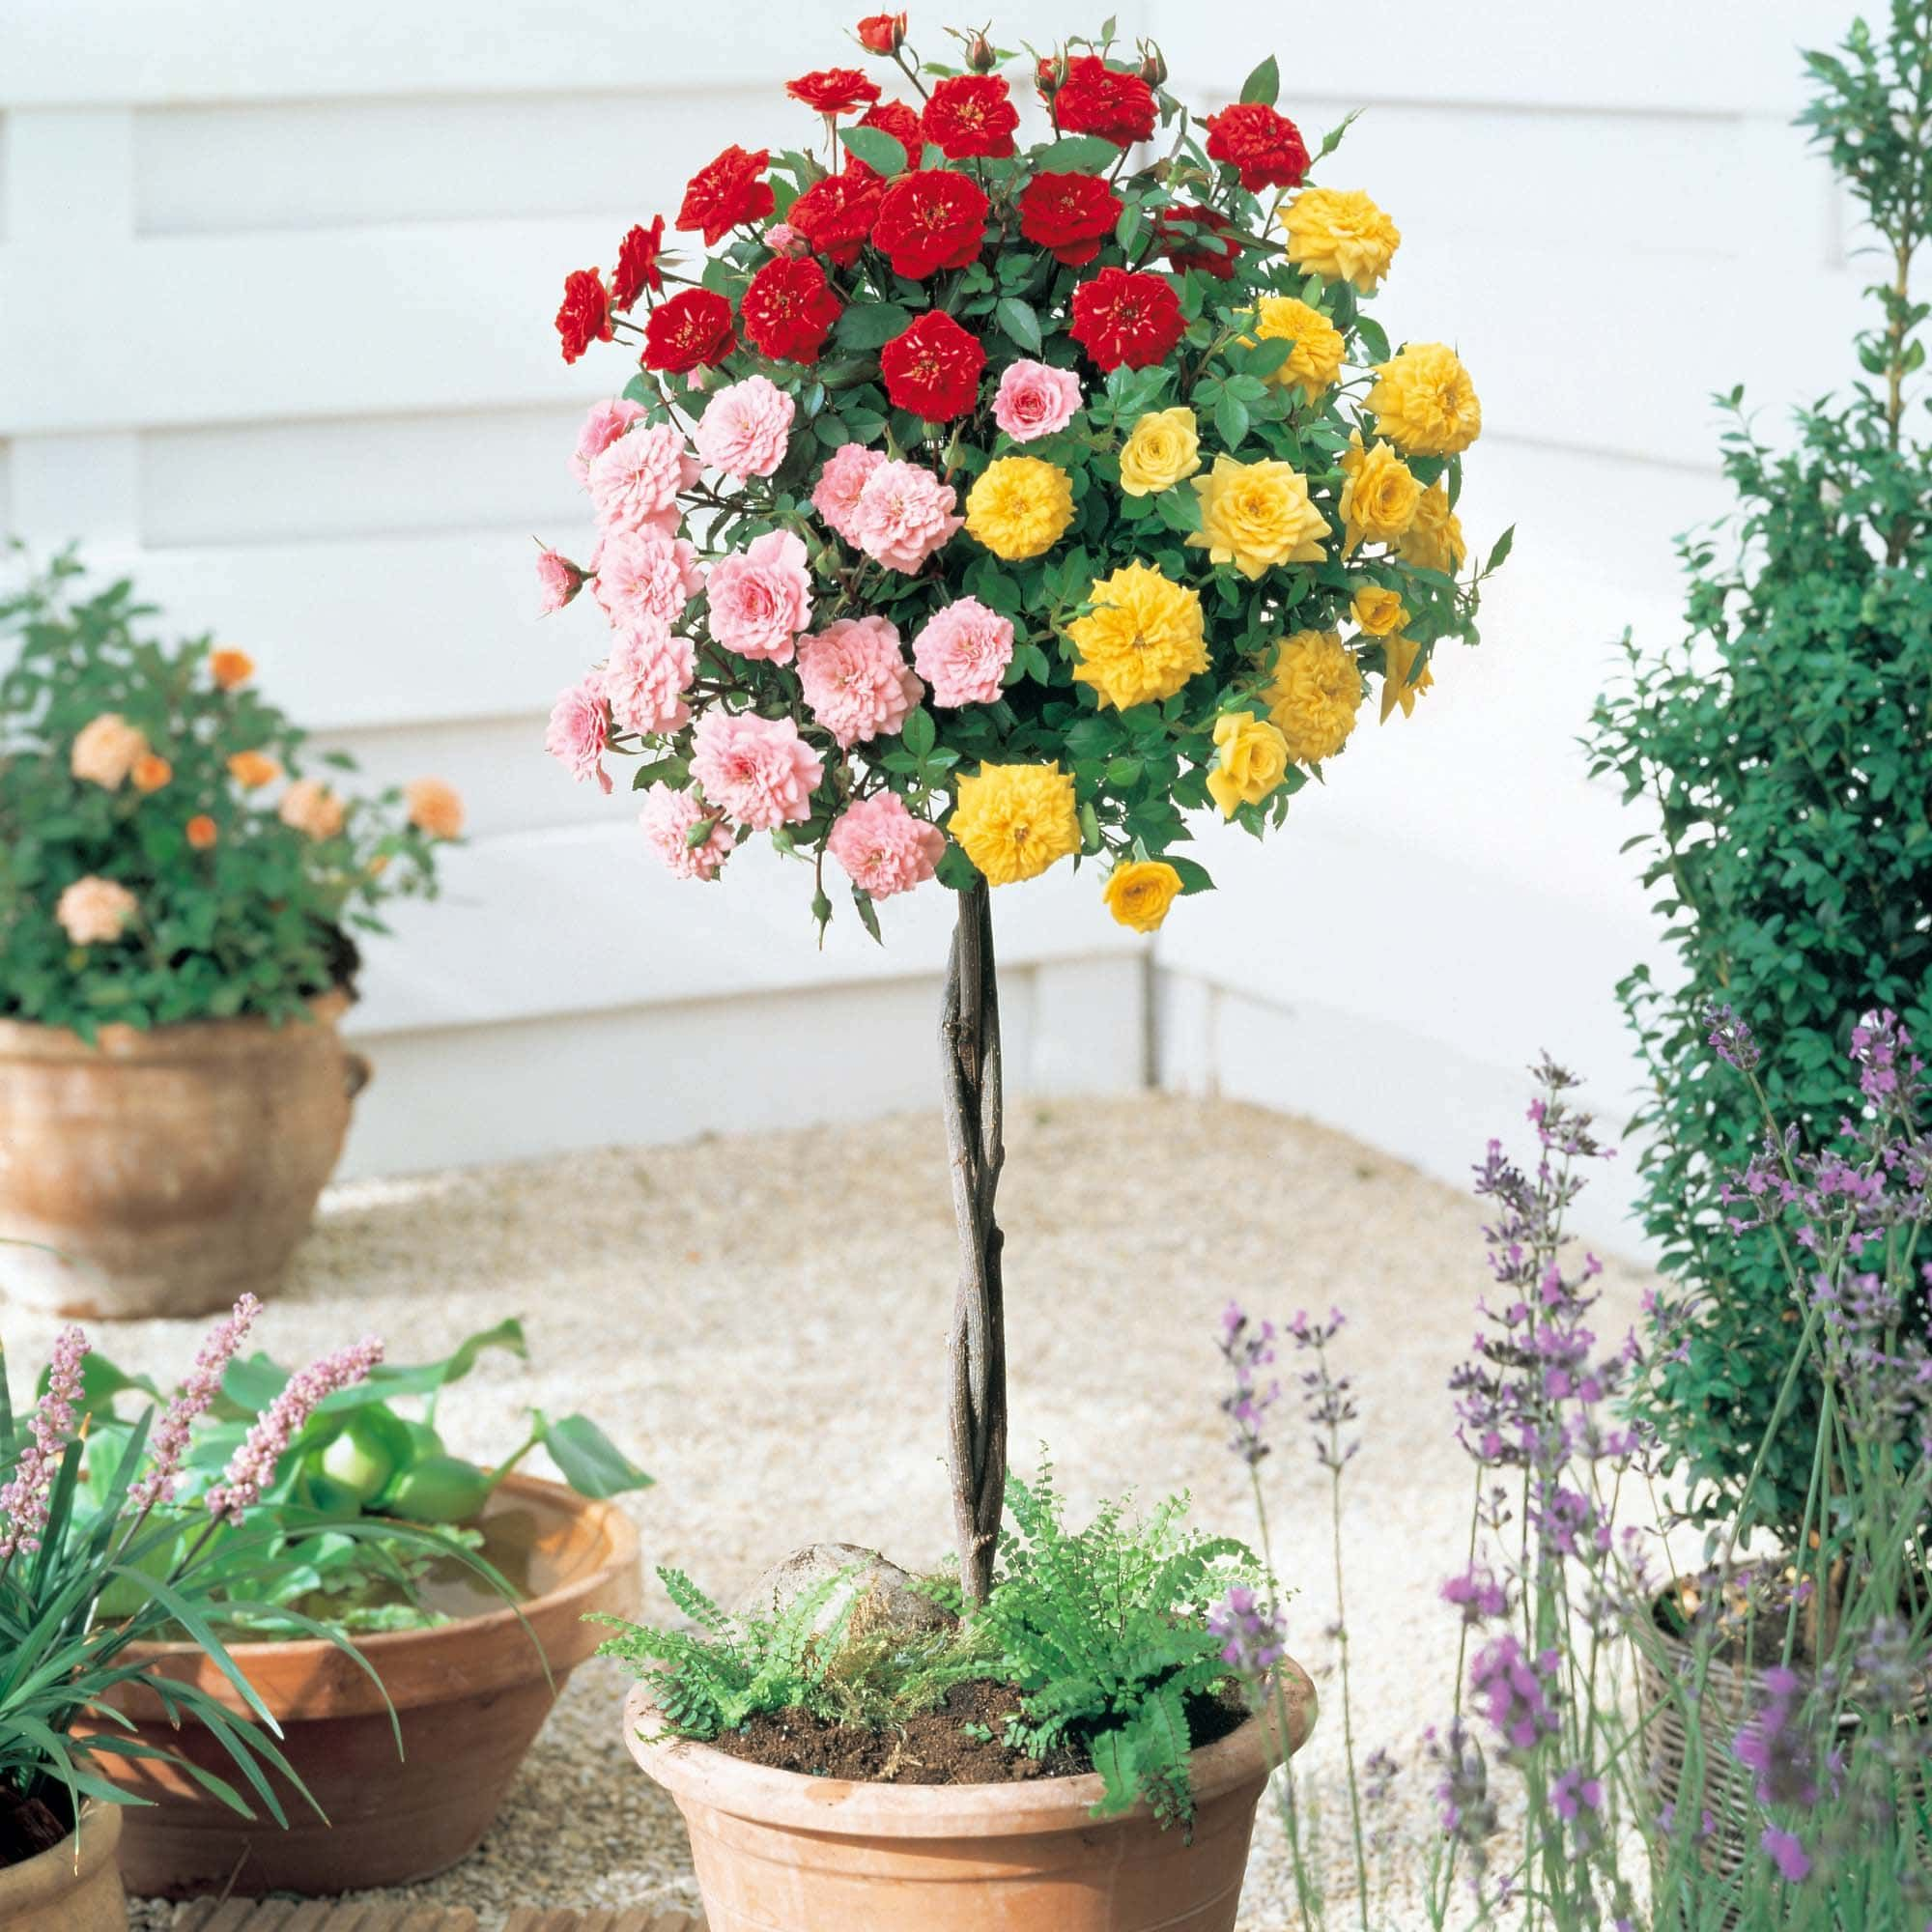 Штамбовая роза: посадка, размножение, уход и прививка